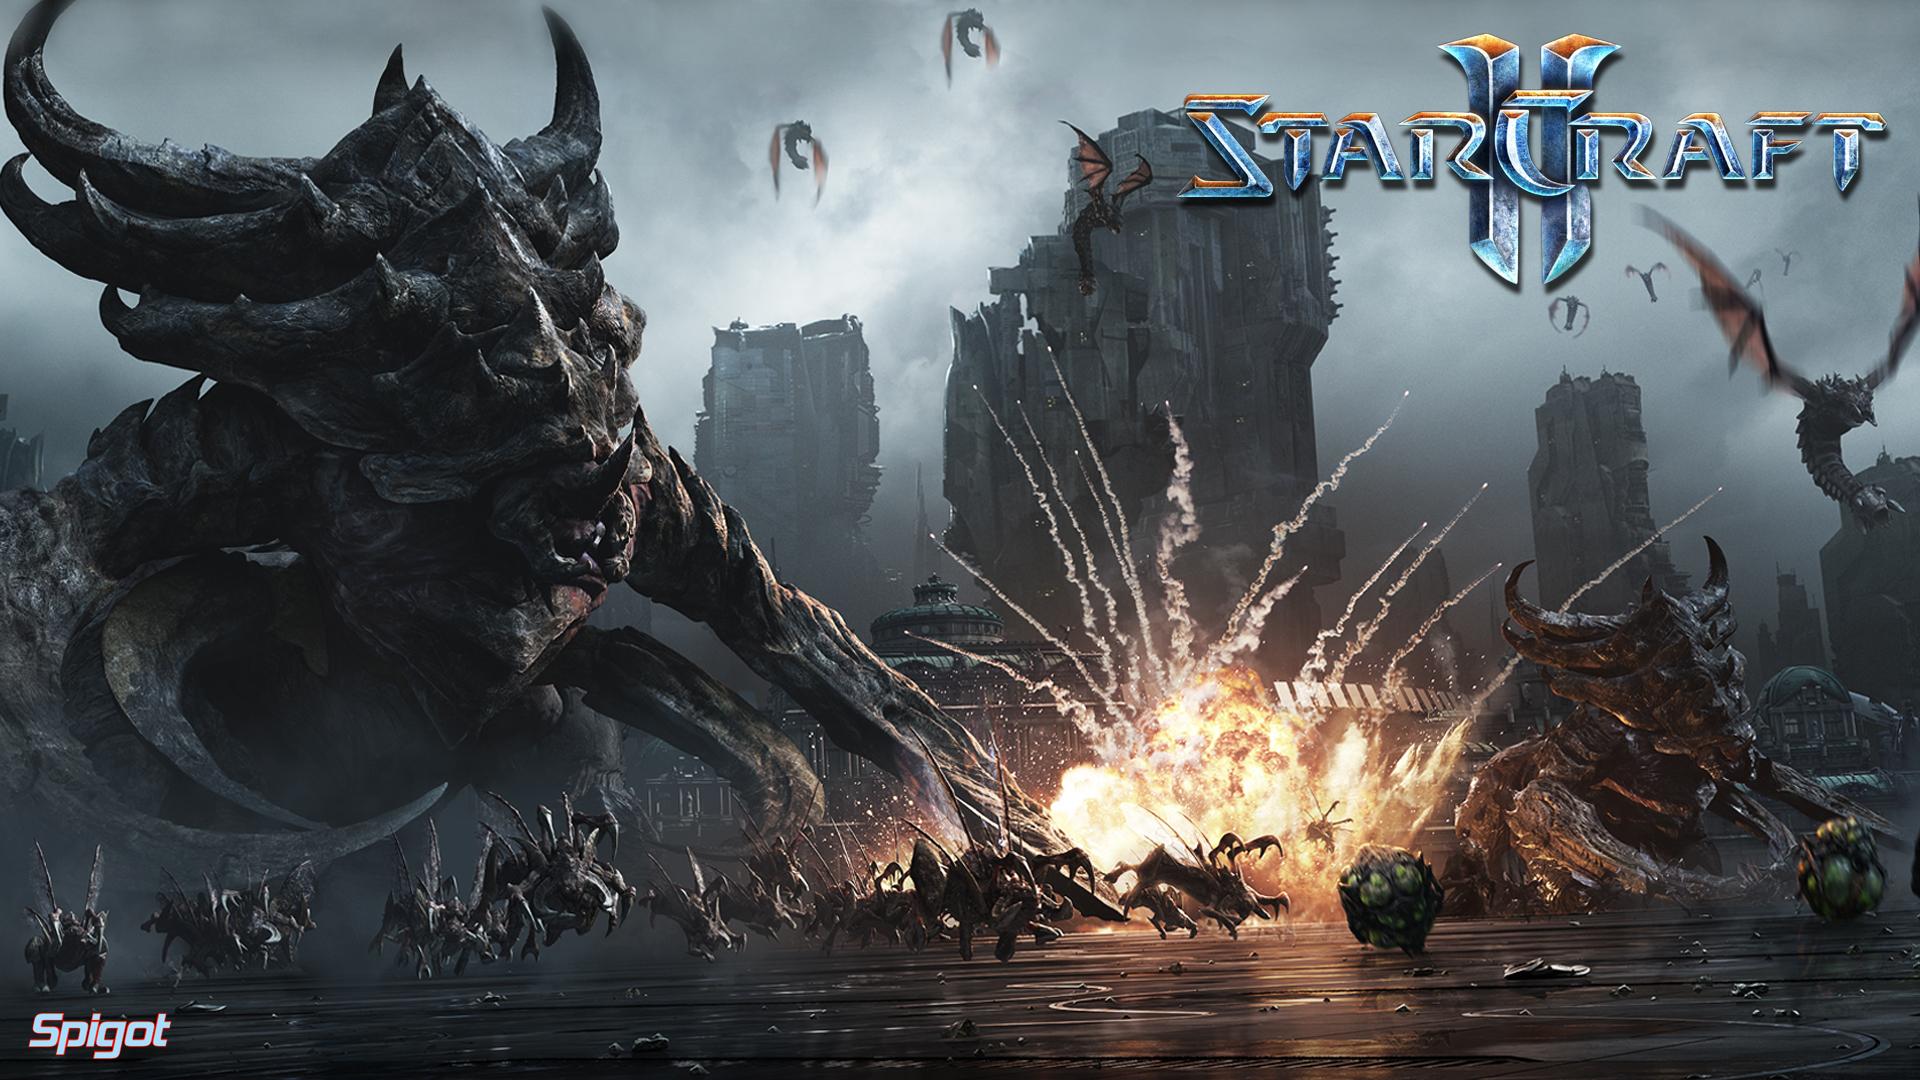 76] Starcraft2 Wallpaper on WallpaperSafari 1920x1080